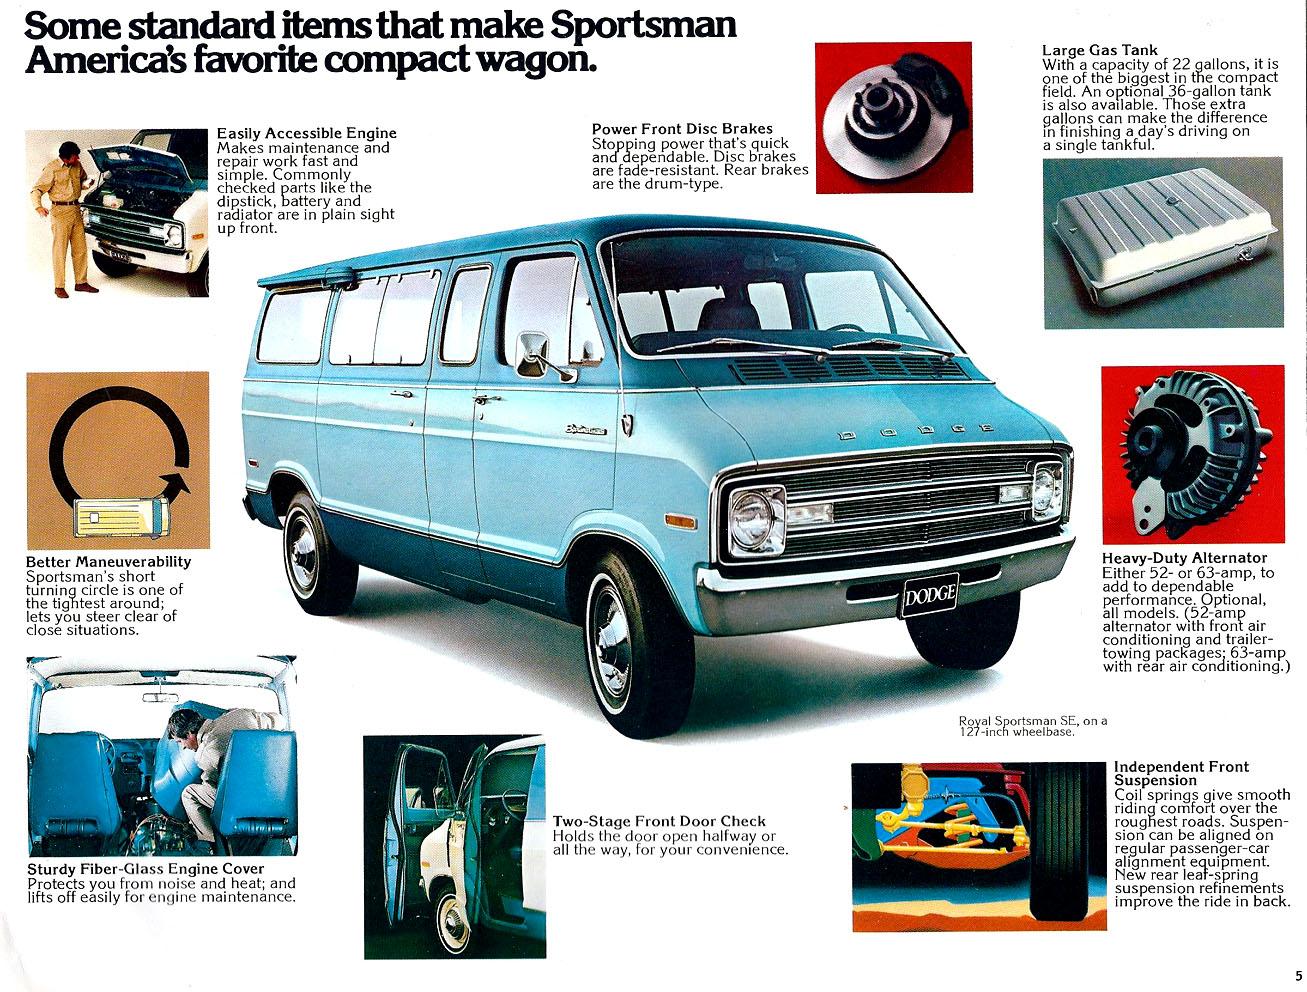 1976 dodge sportsman – 1970 Dodge Challenger